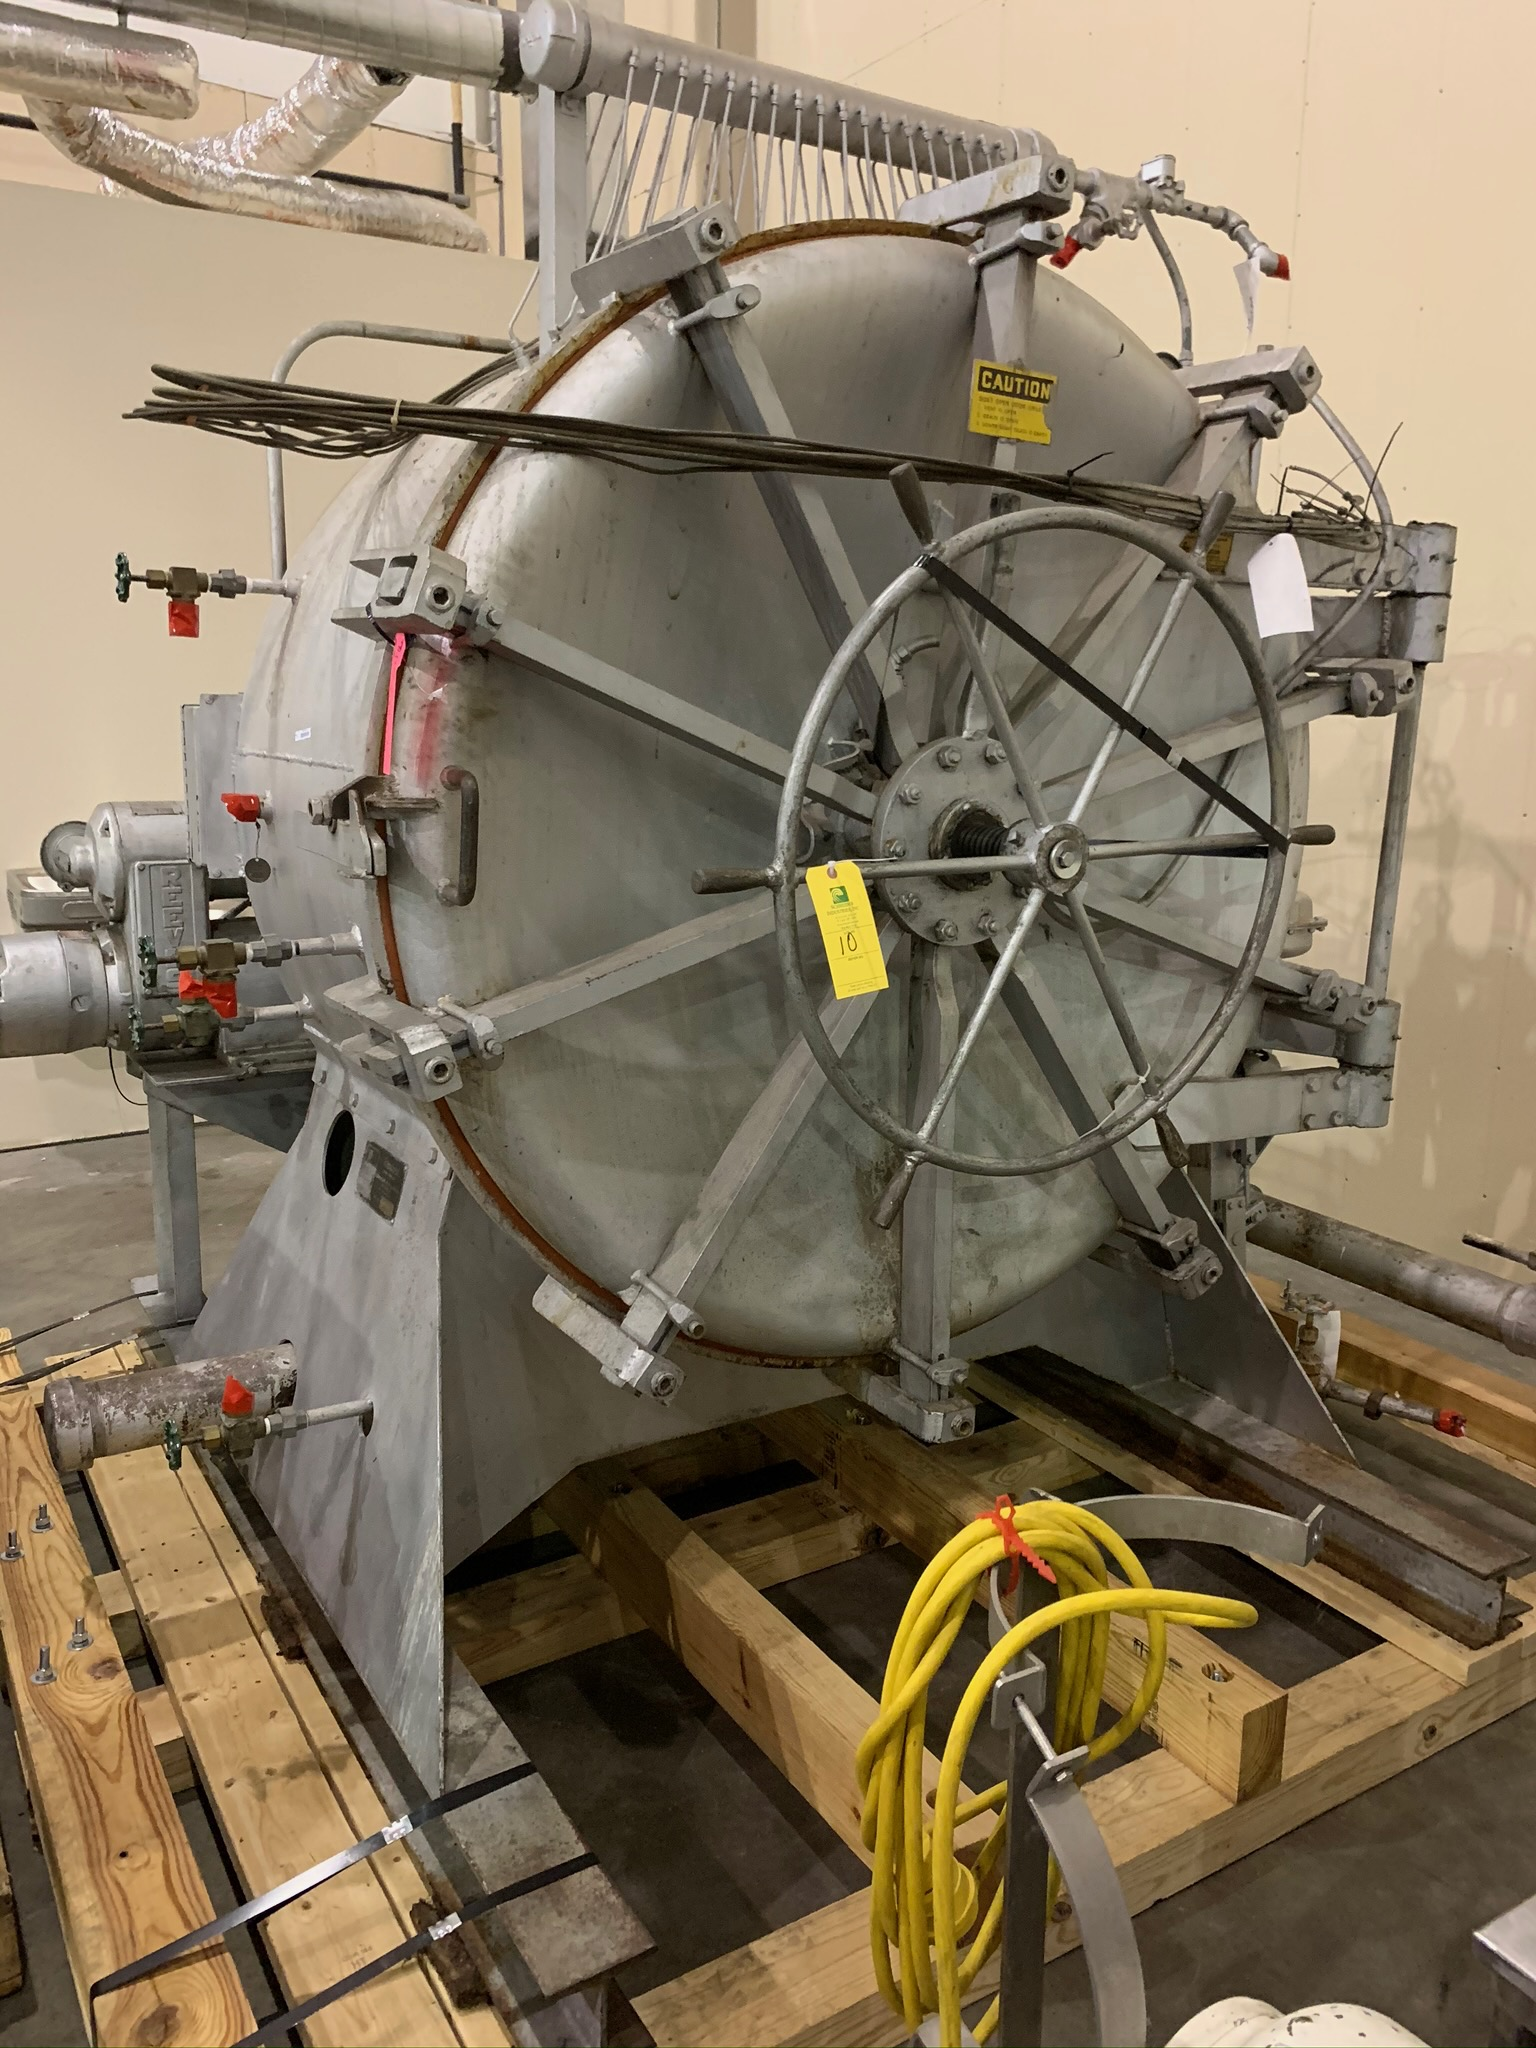 Lot 10 - FMC Steritort Rotary Sterlizer Lab Size Retort Unit S/N 36085172 (Rigging Fee - $300)